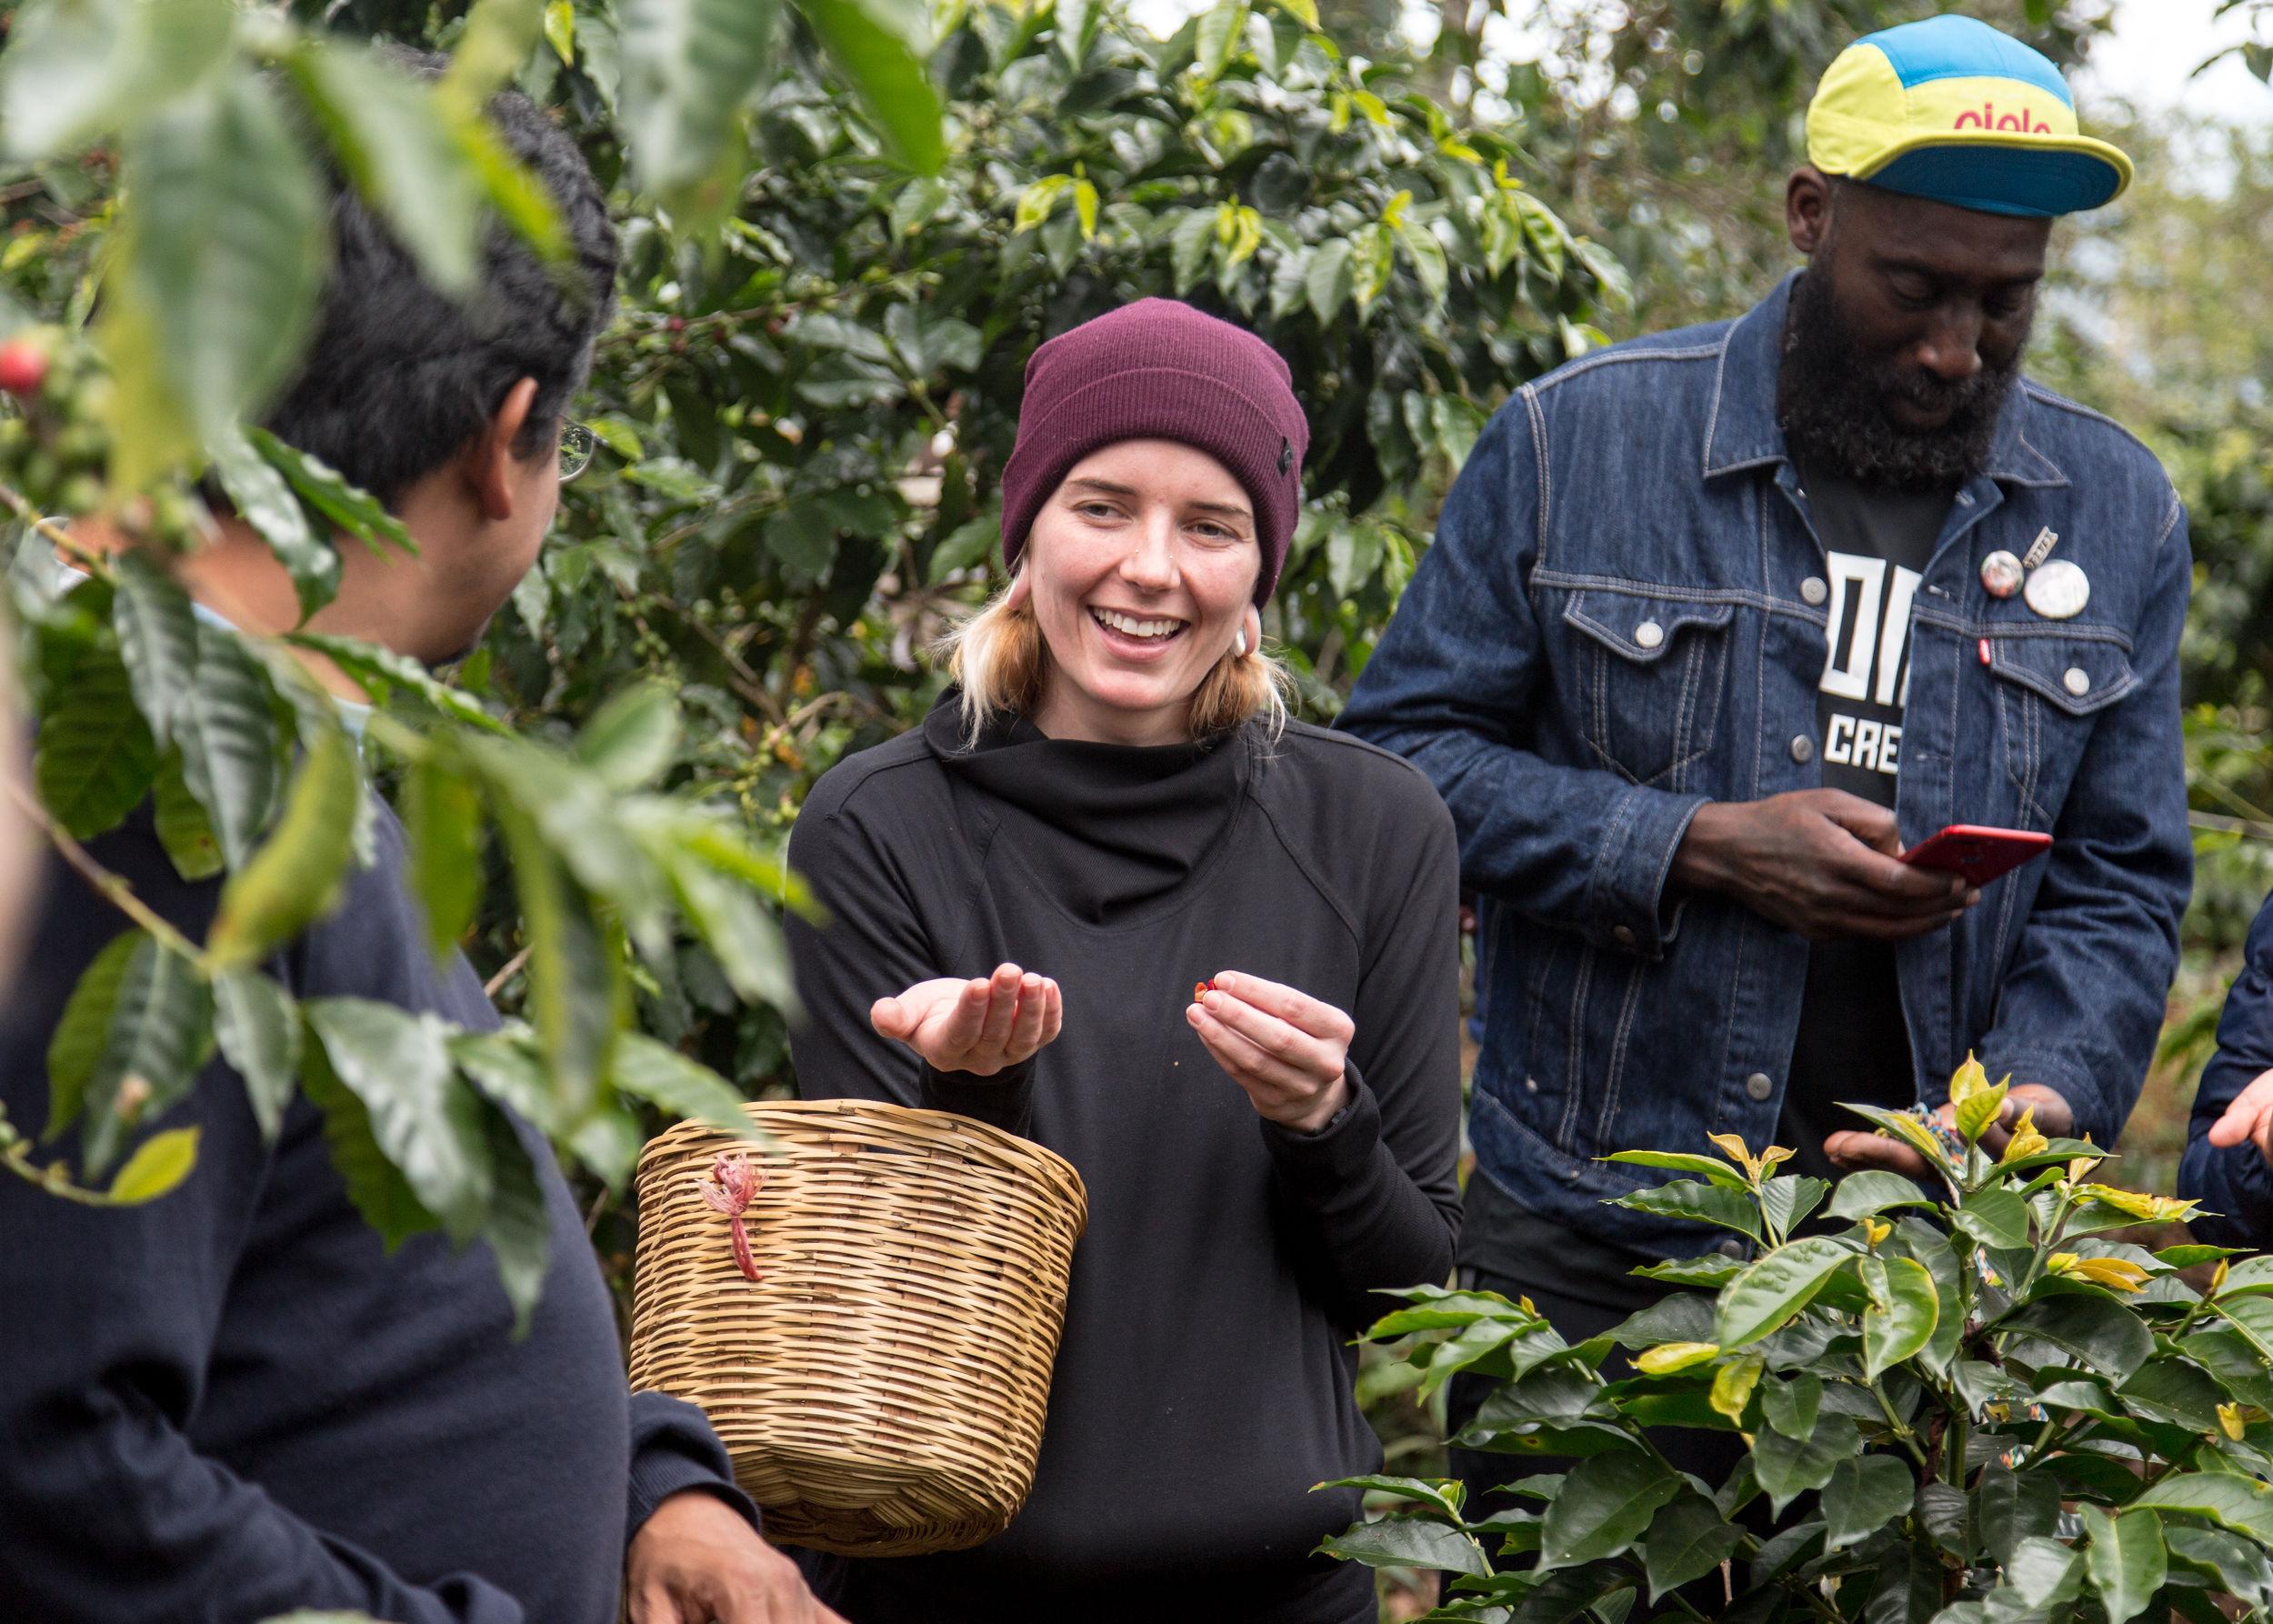 coffee berry picking. chiapas, mexico.